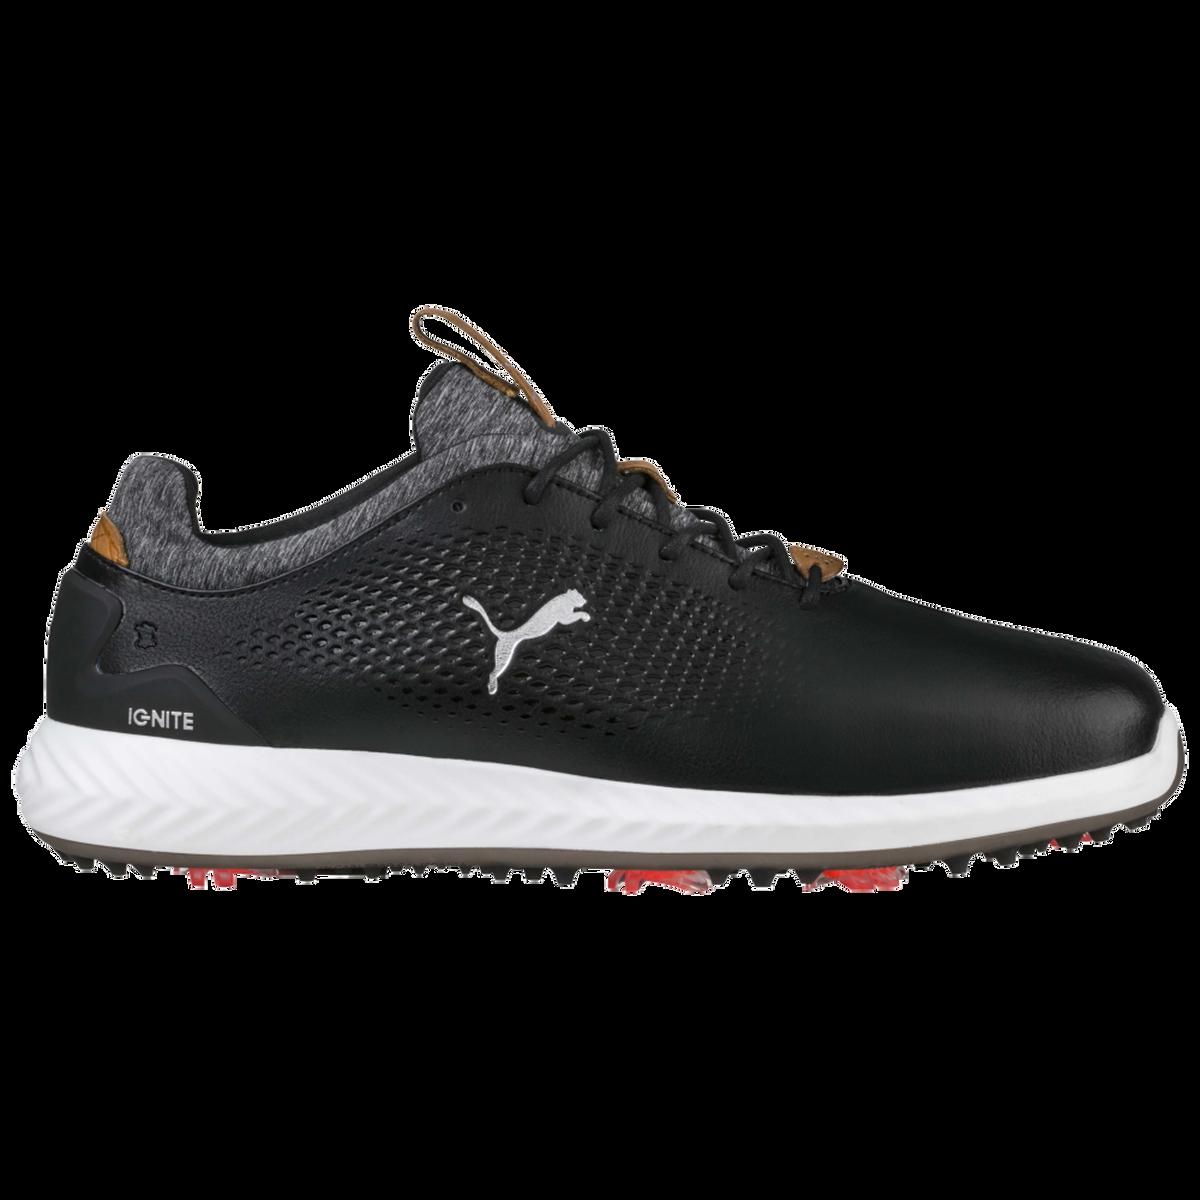 61aa3988b00 Images. PUMA IGNITE PWRADAPT Leather Men  39 s Golf Shoe - Black